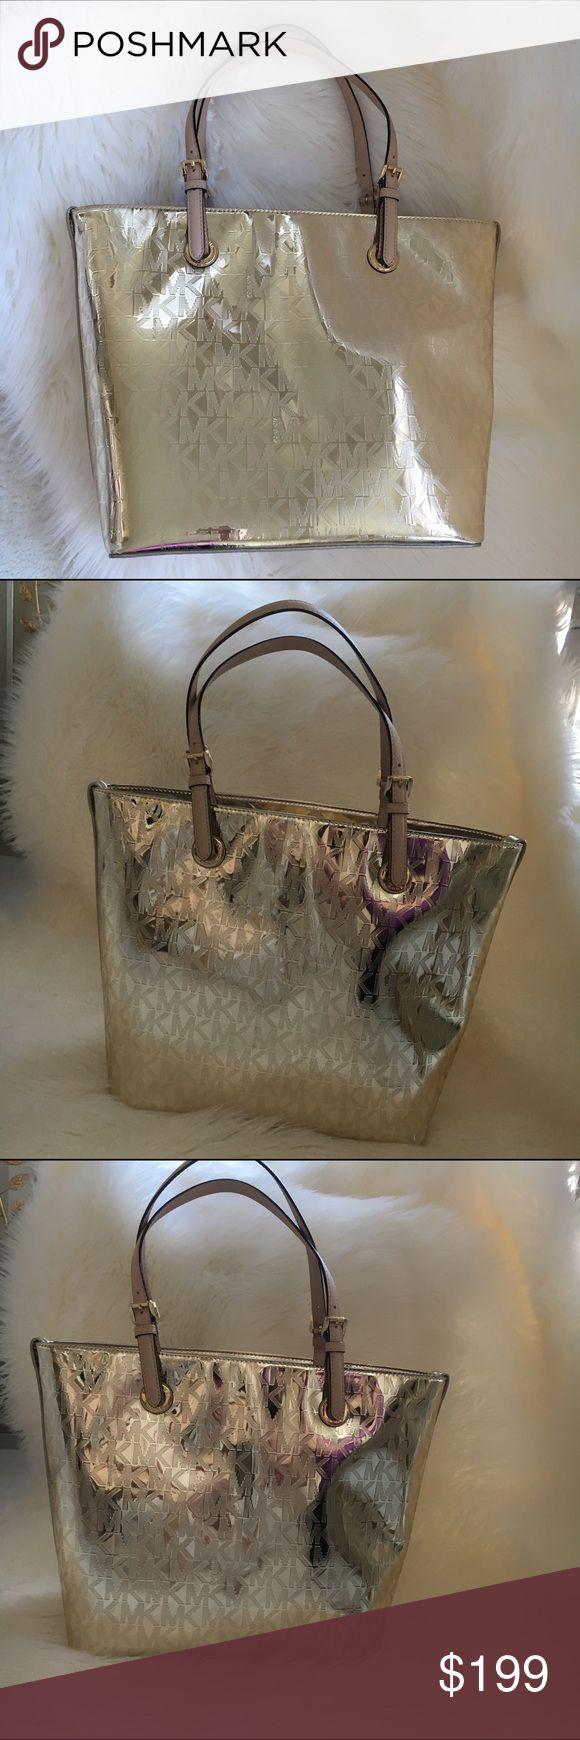 MICHAEL KORS gold shoulder bag Jet set handbag in Pale Gold by Michael Kors . Straps are a pale tan leather. New ! Authentic 🚫trades Michael Kors Bags Shoulder Bags